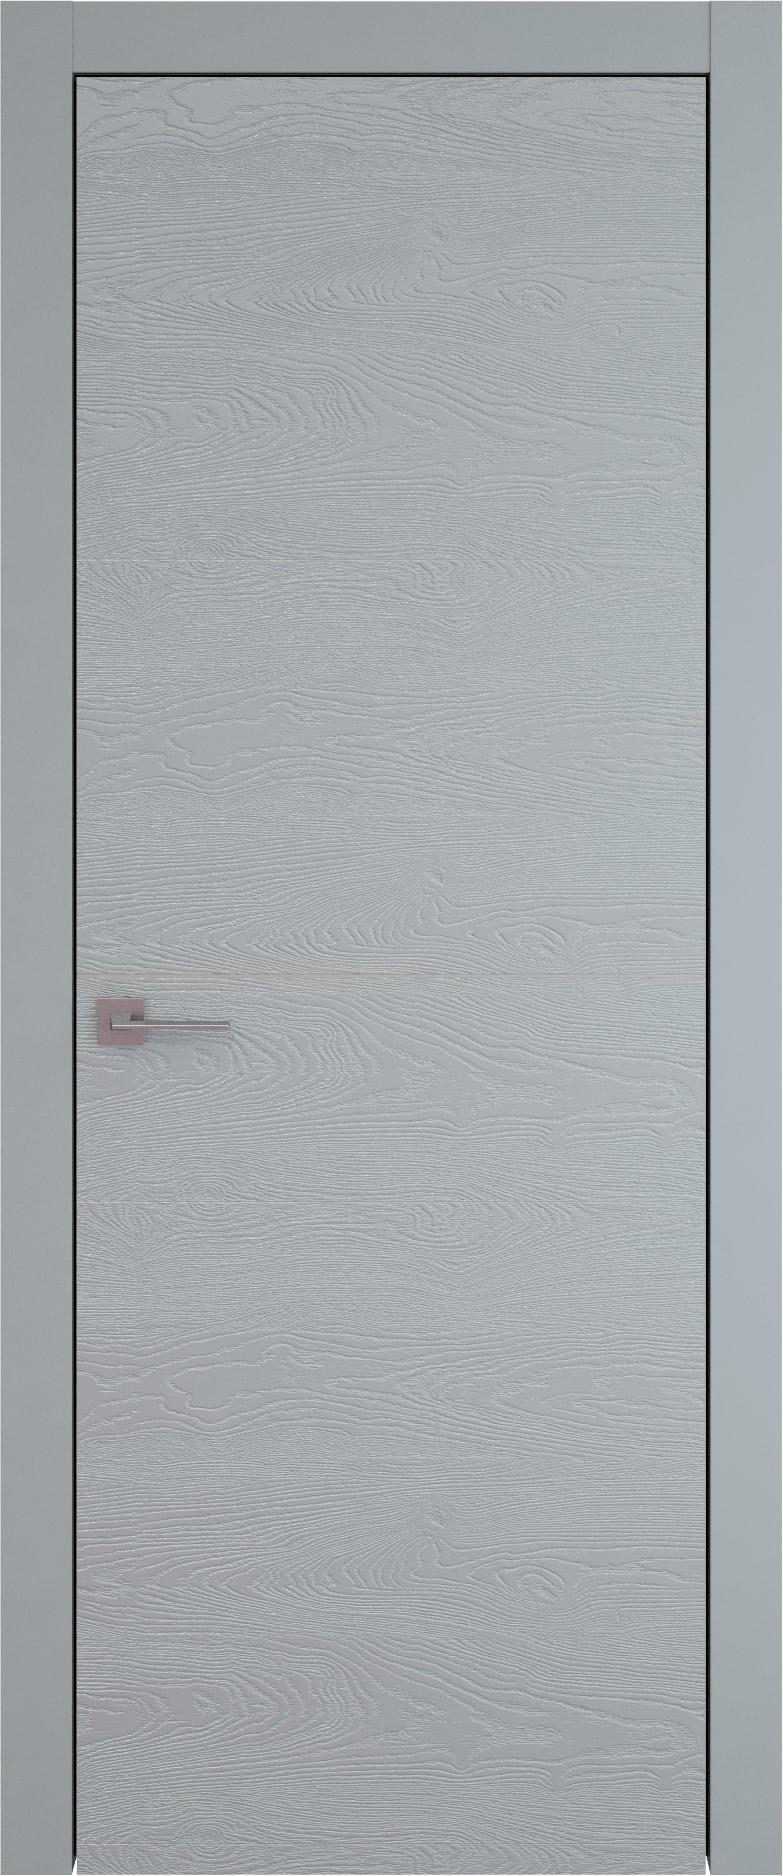 Tivoli Б-3 цвет - Серебристо-серая эмаль по шпону (RAL 7045) Без стекла (ДГ)